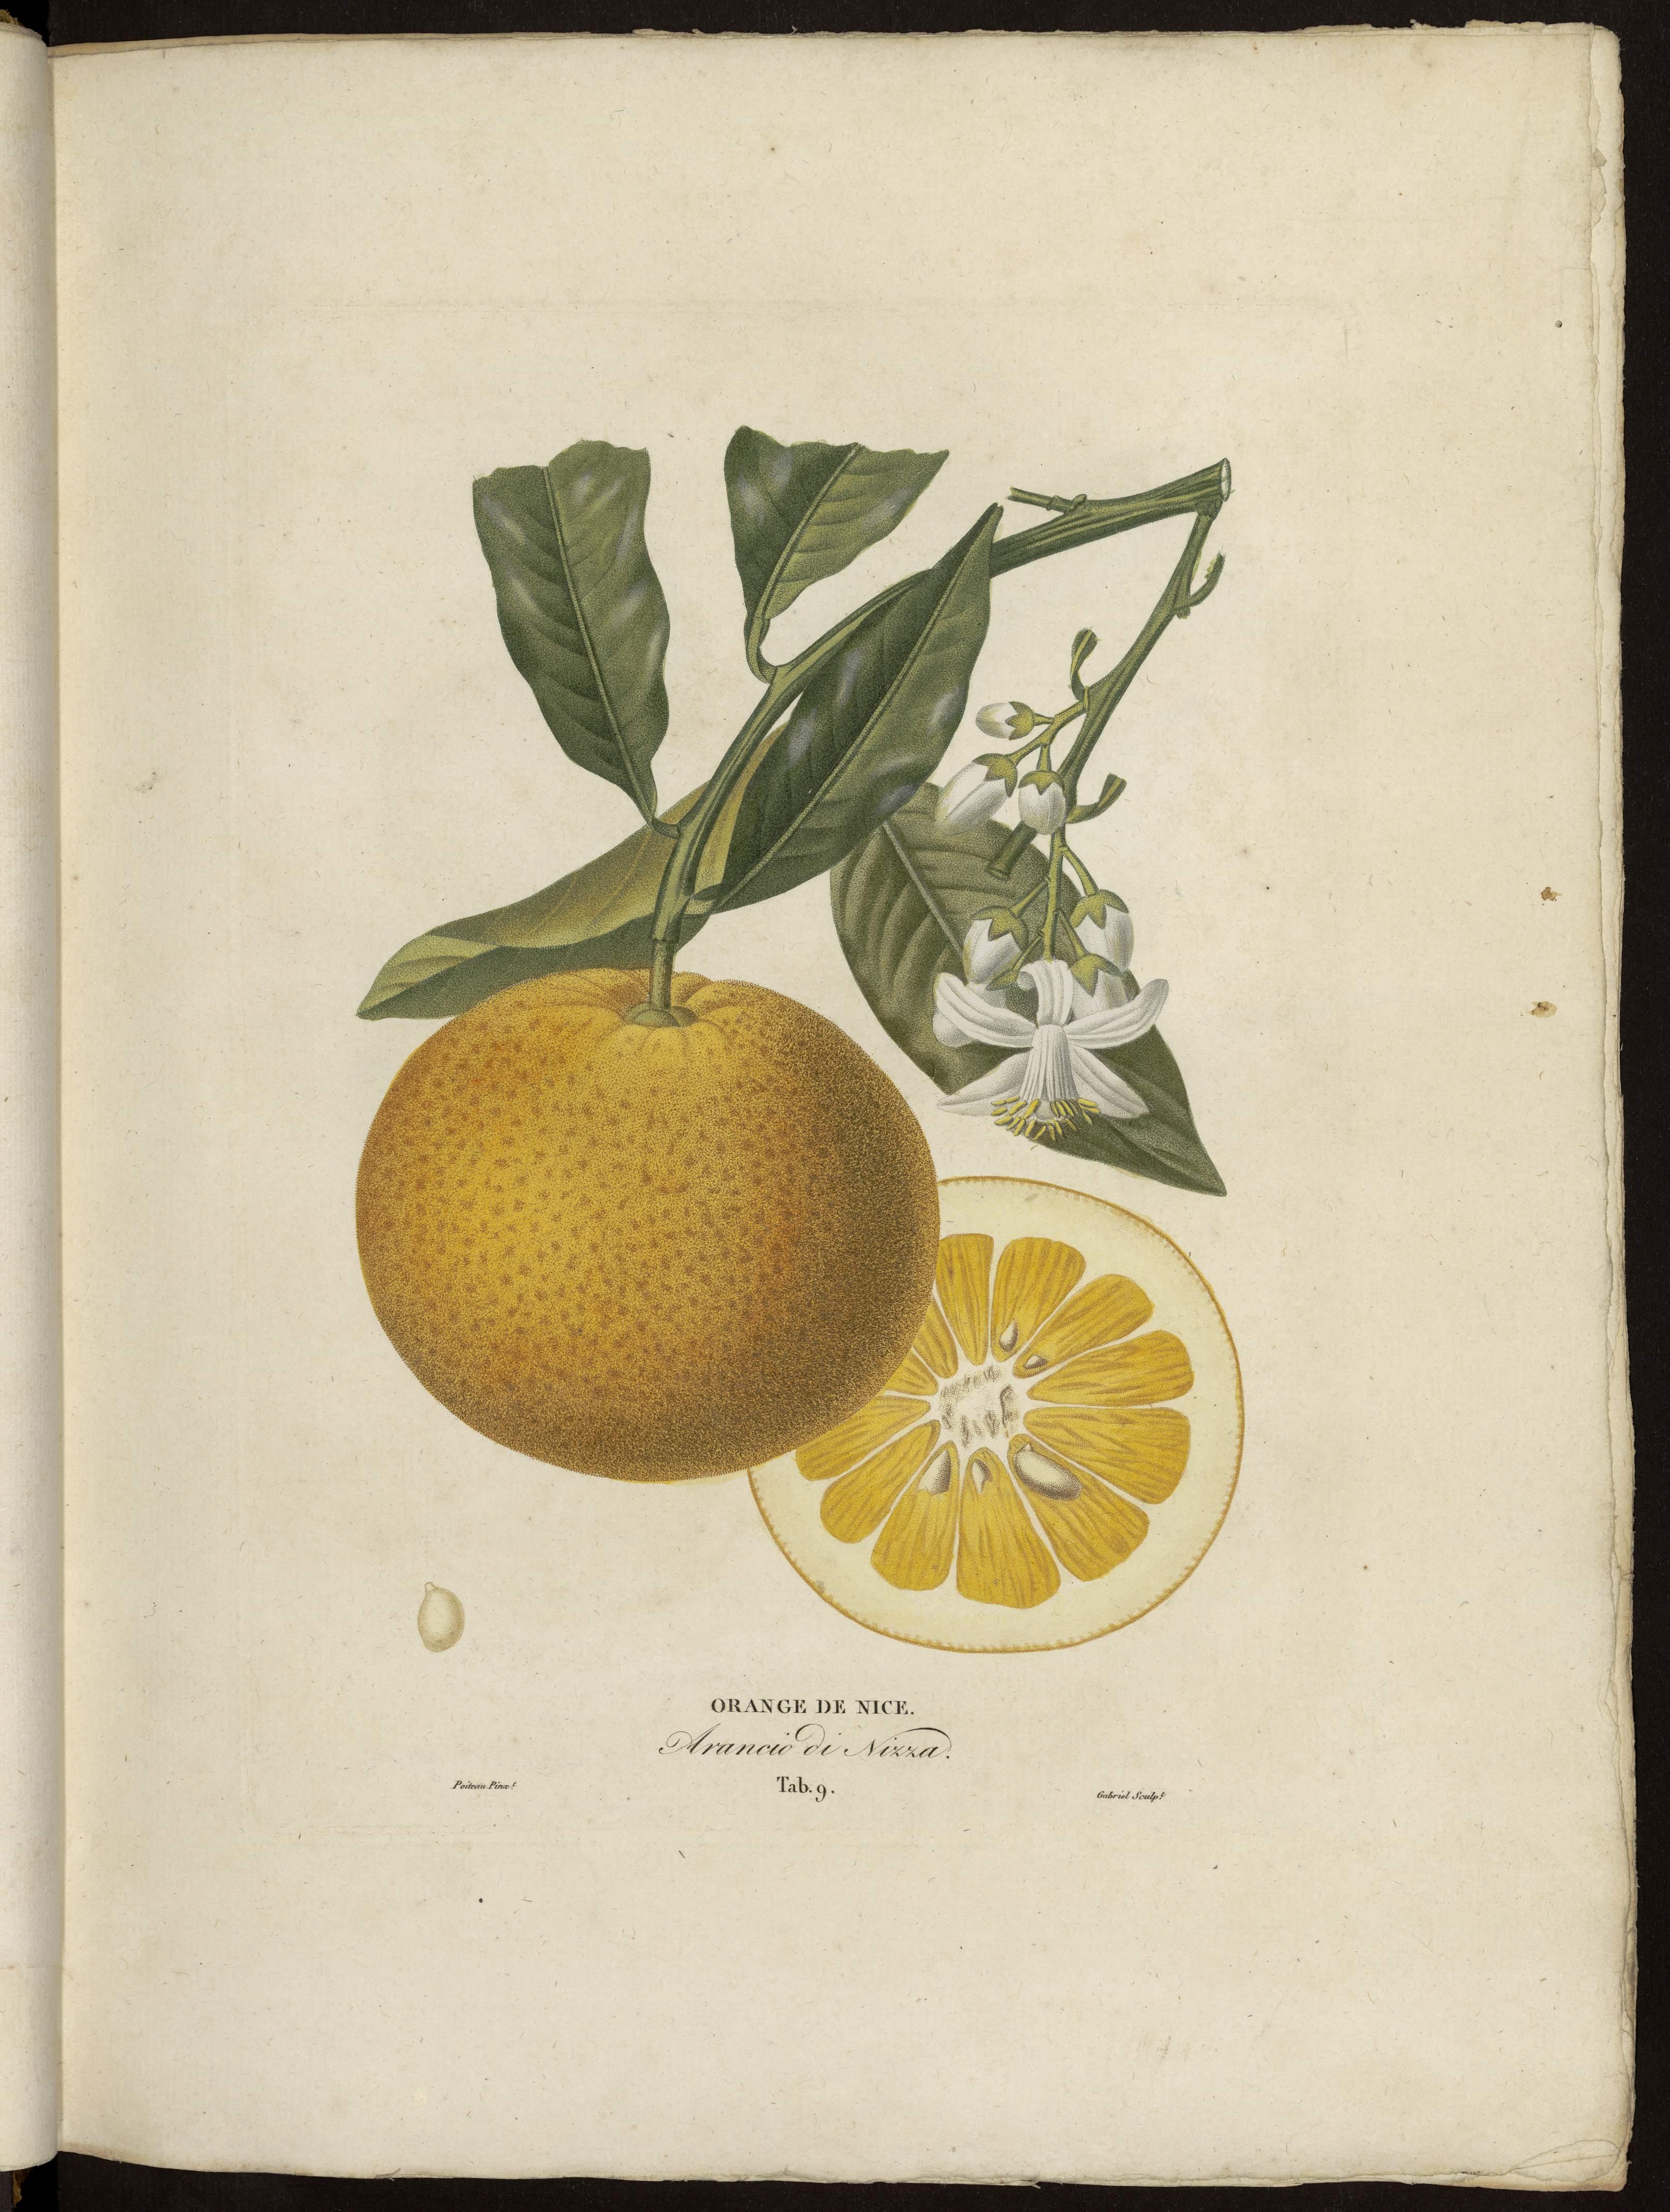 Orange de Nice